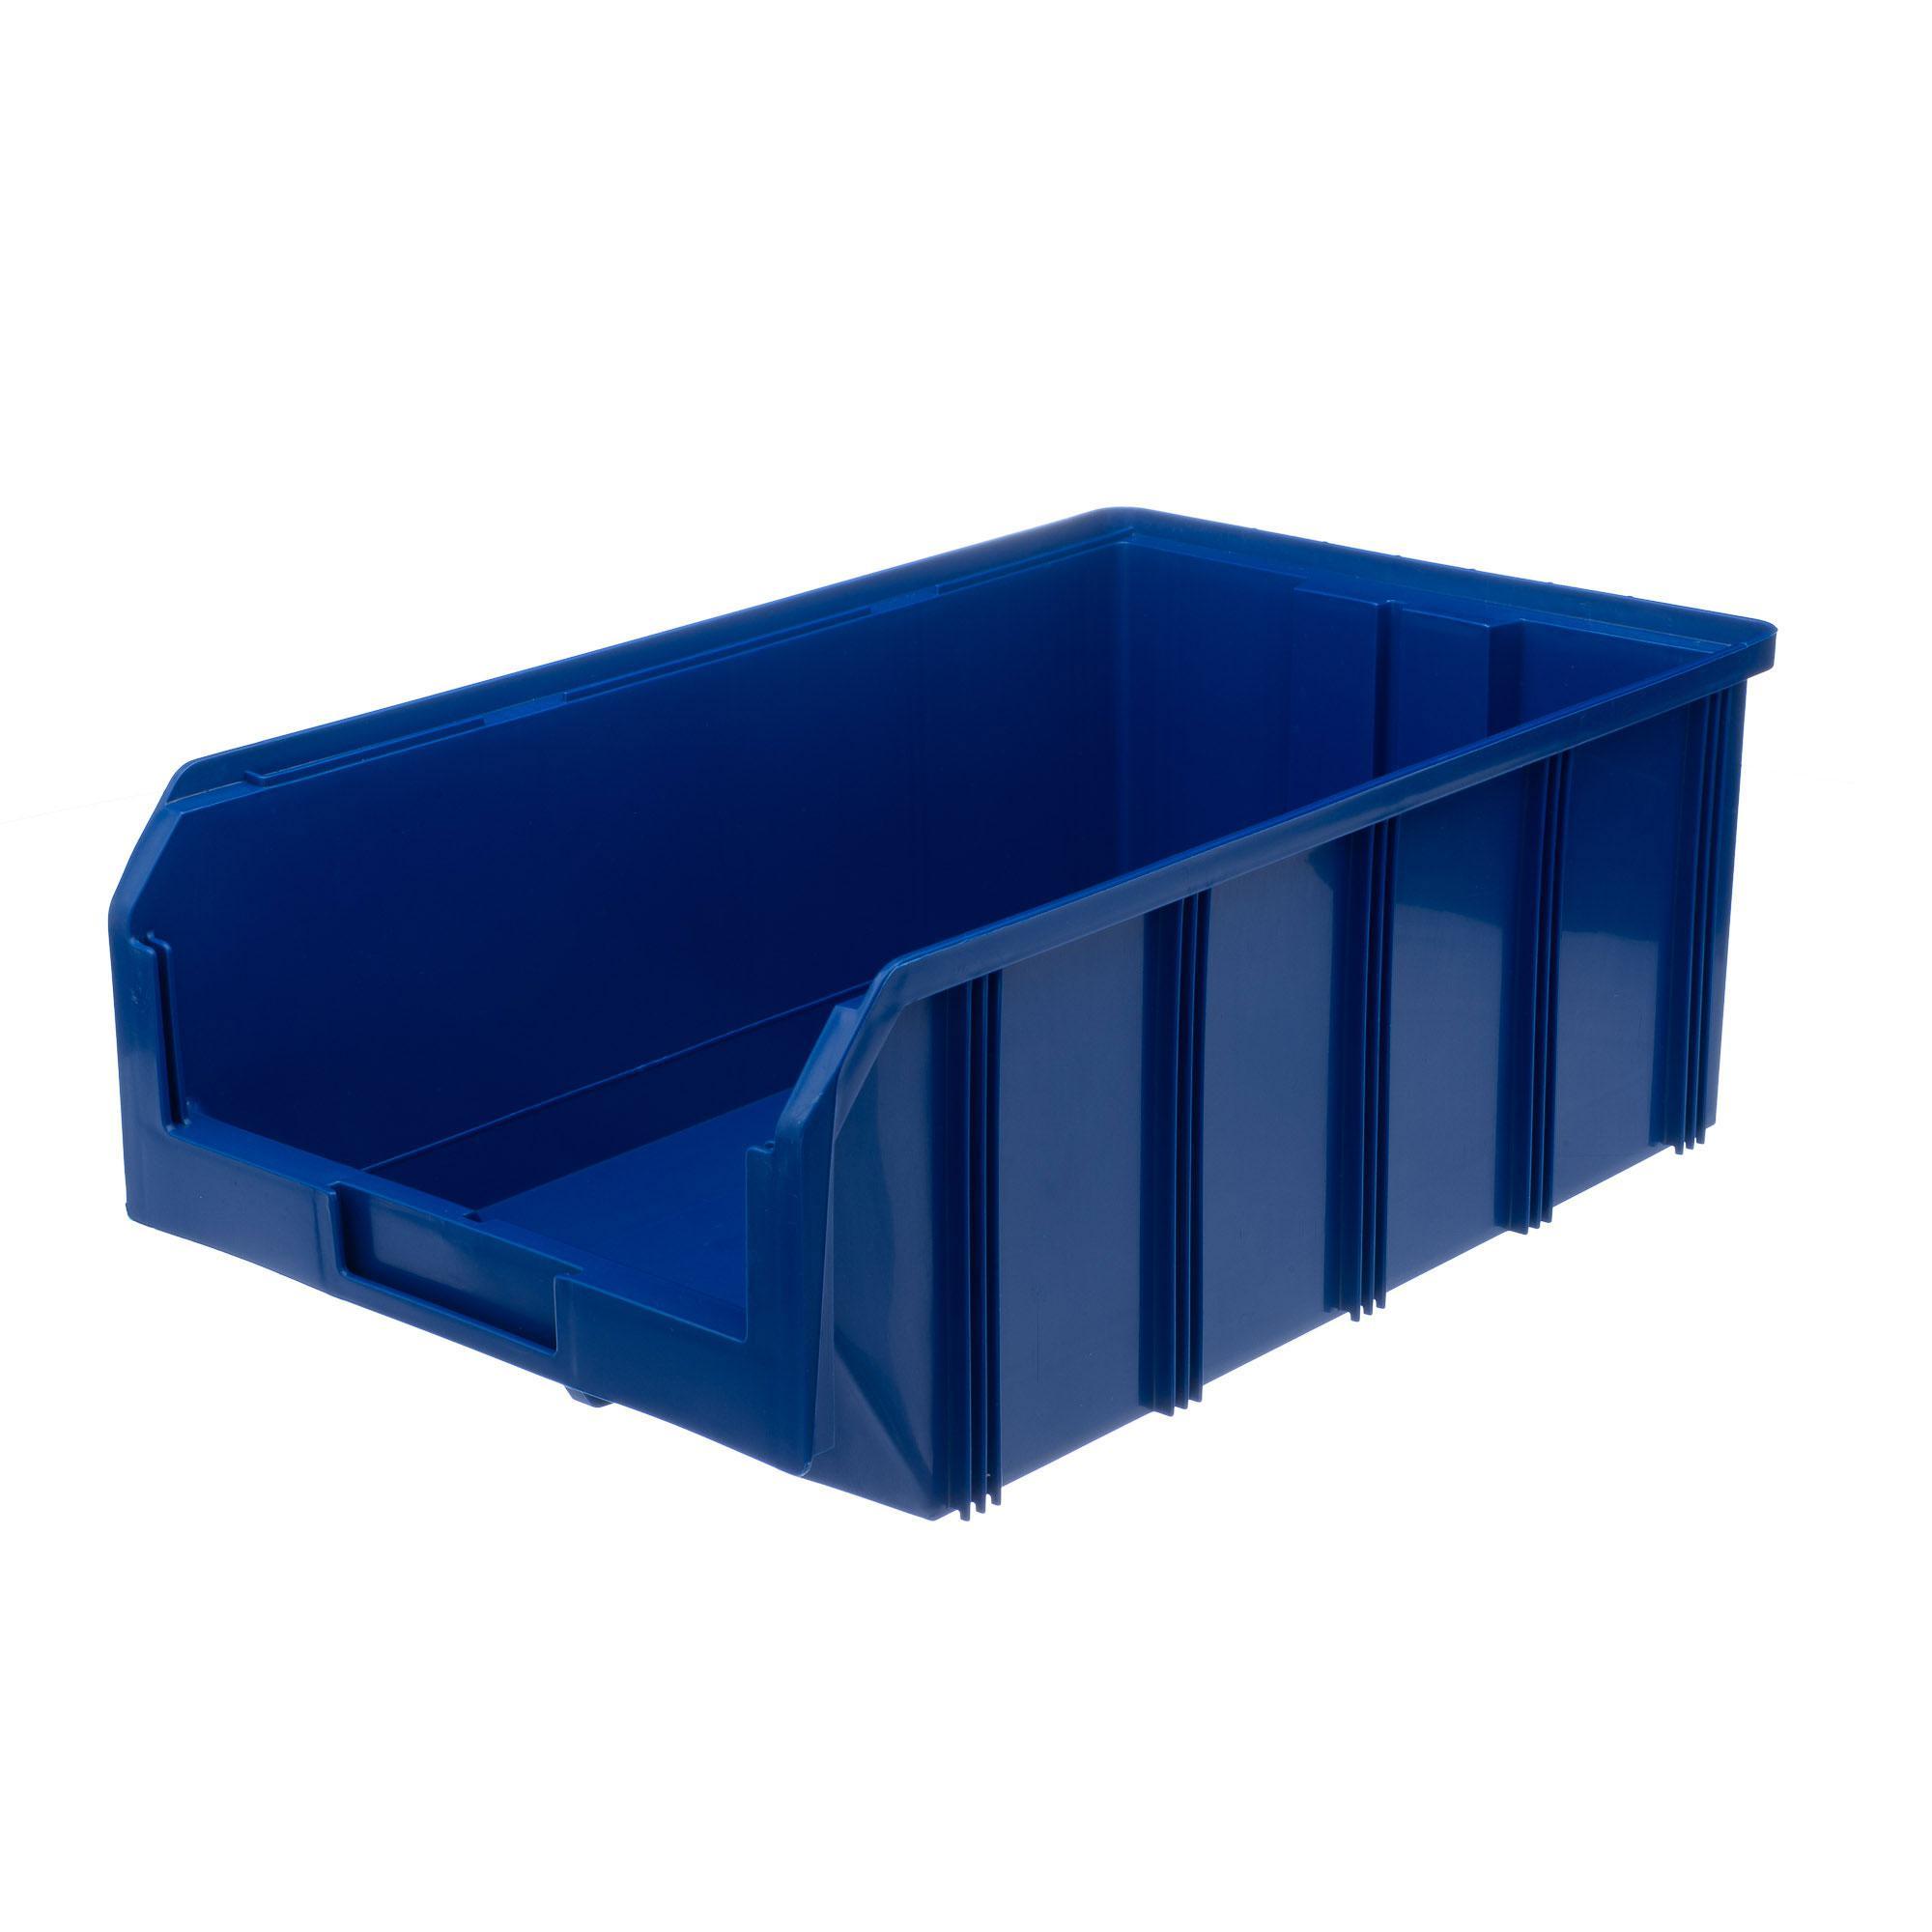 Ящик СТЕЛЛА V-4 синий цены онлайн